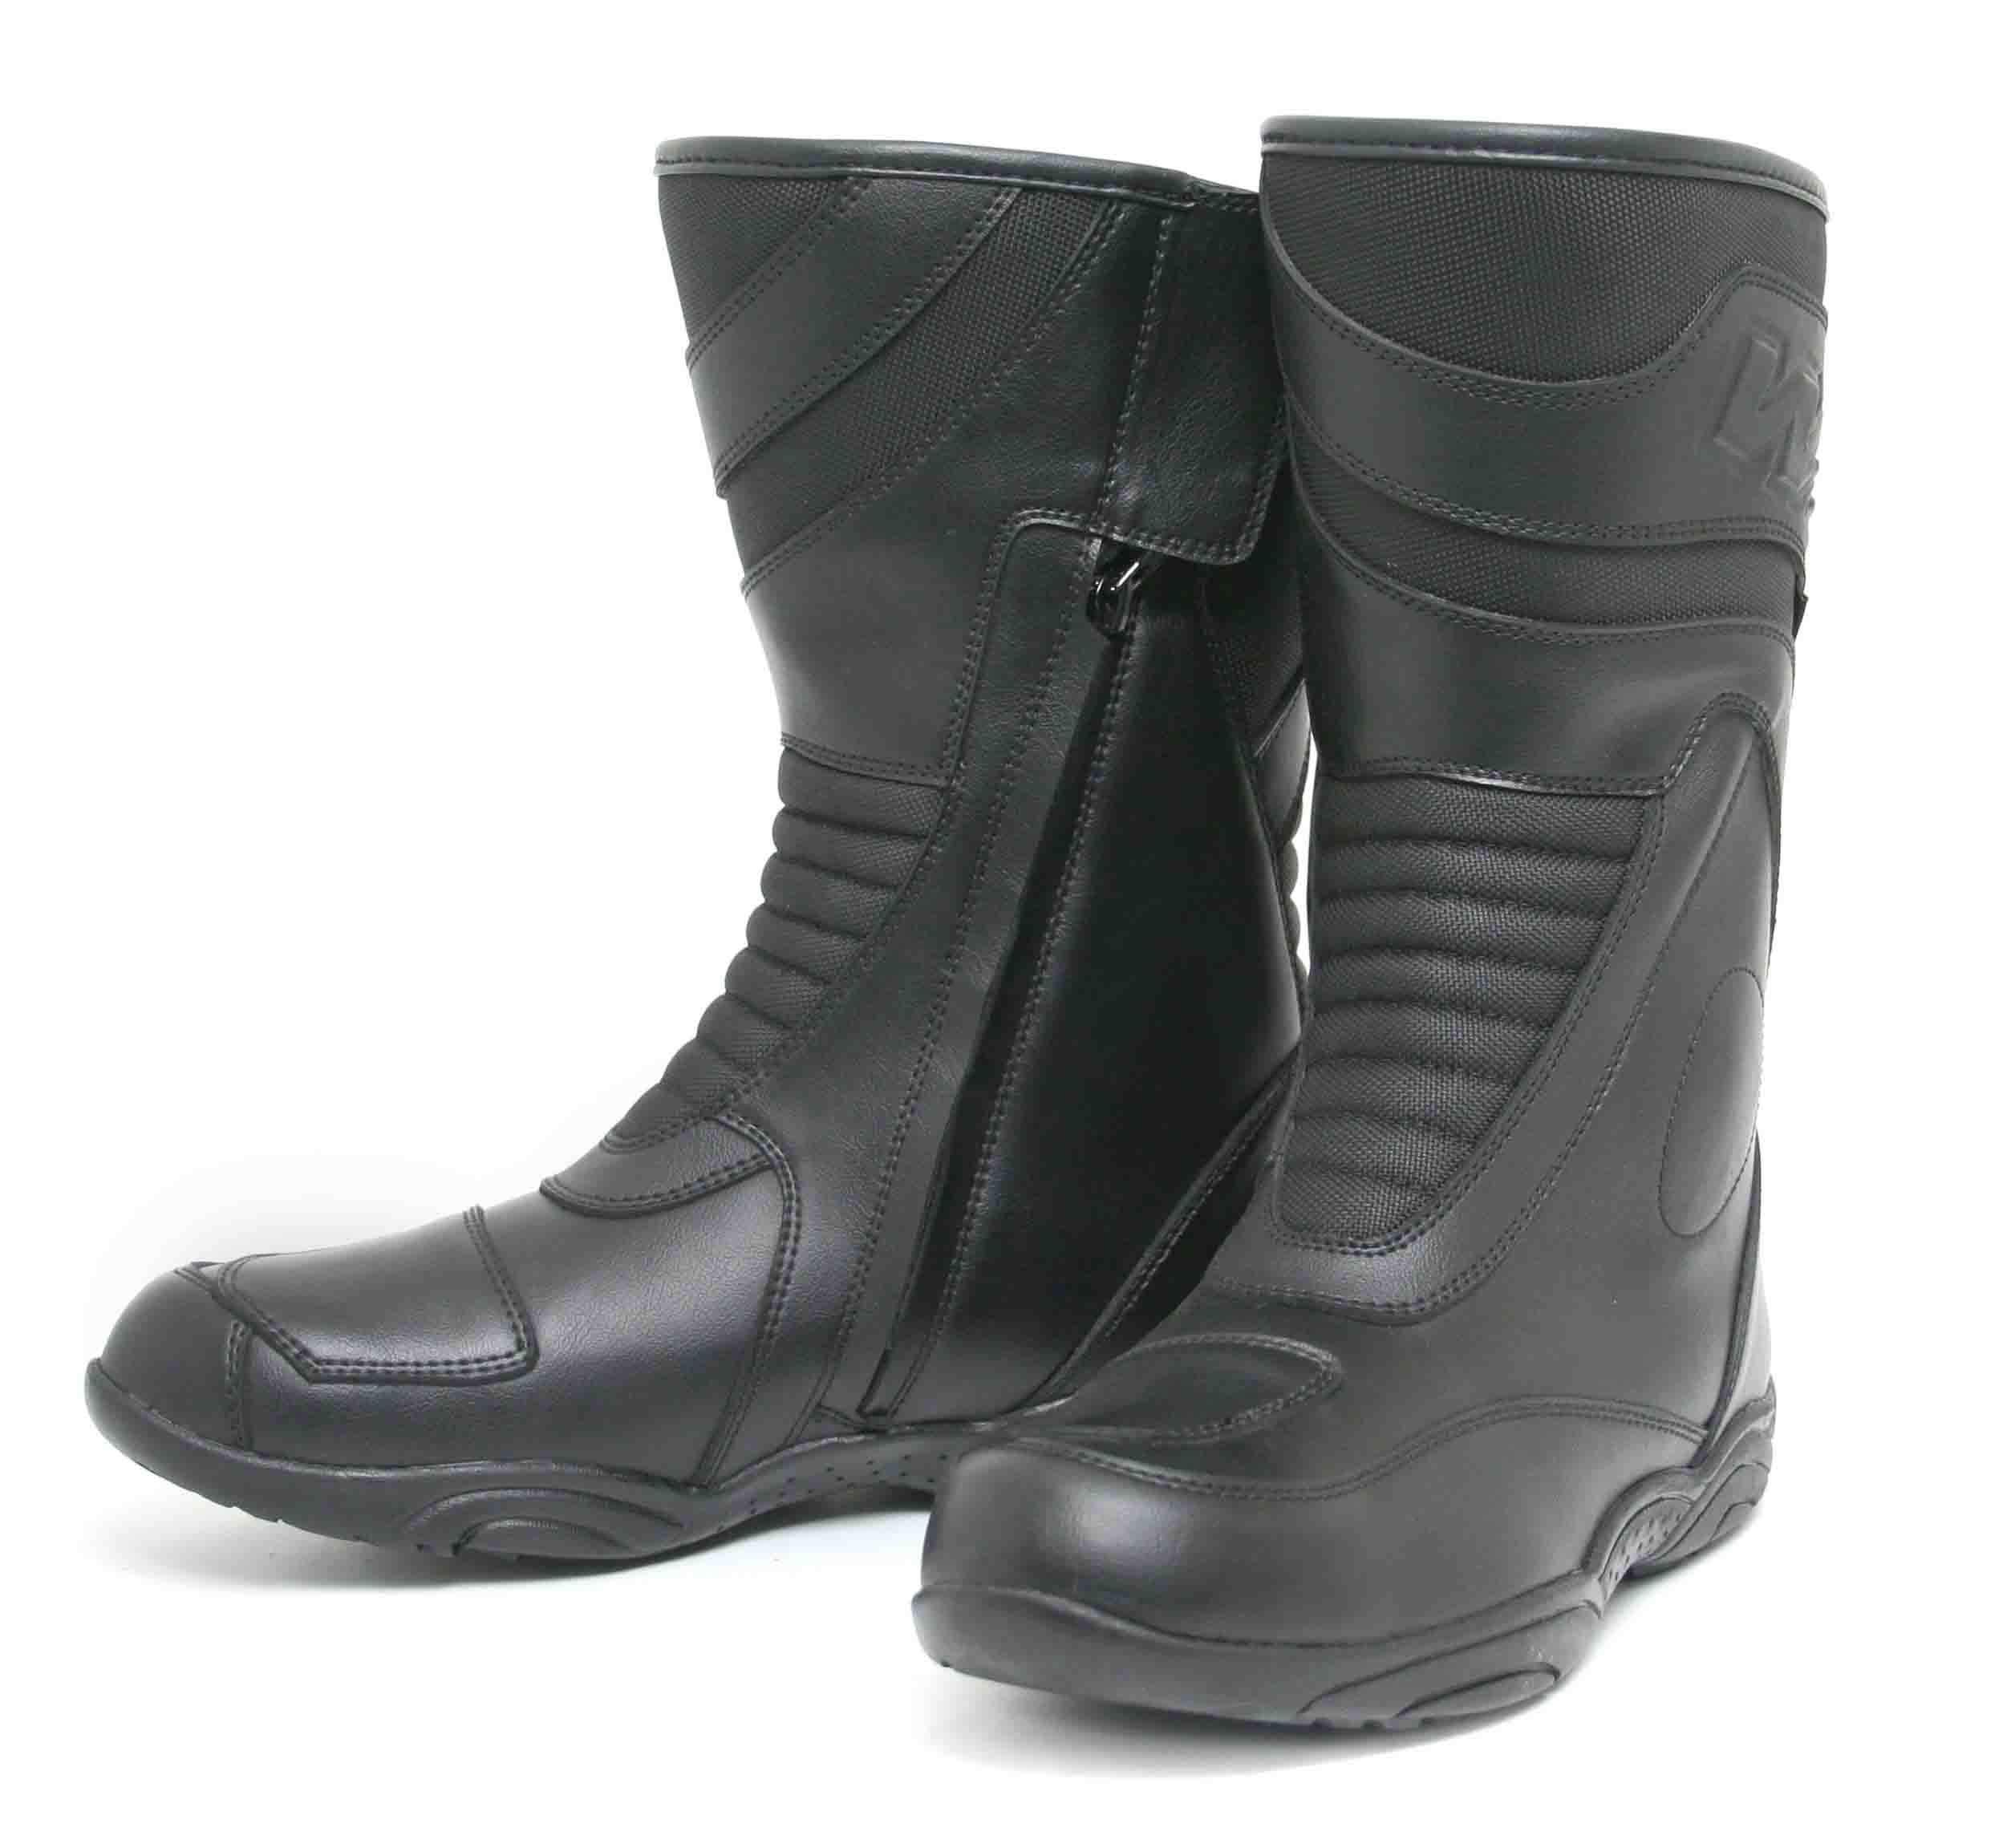 botas de moto de carretera Invictus